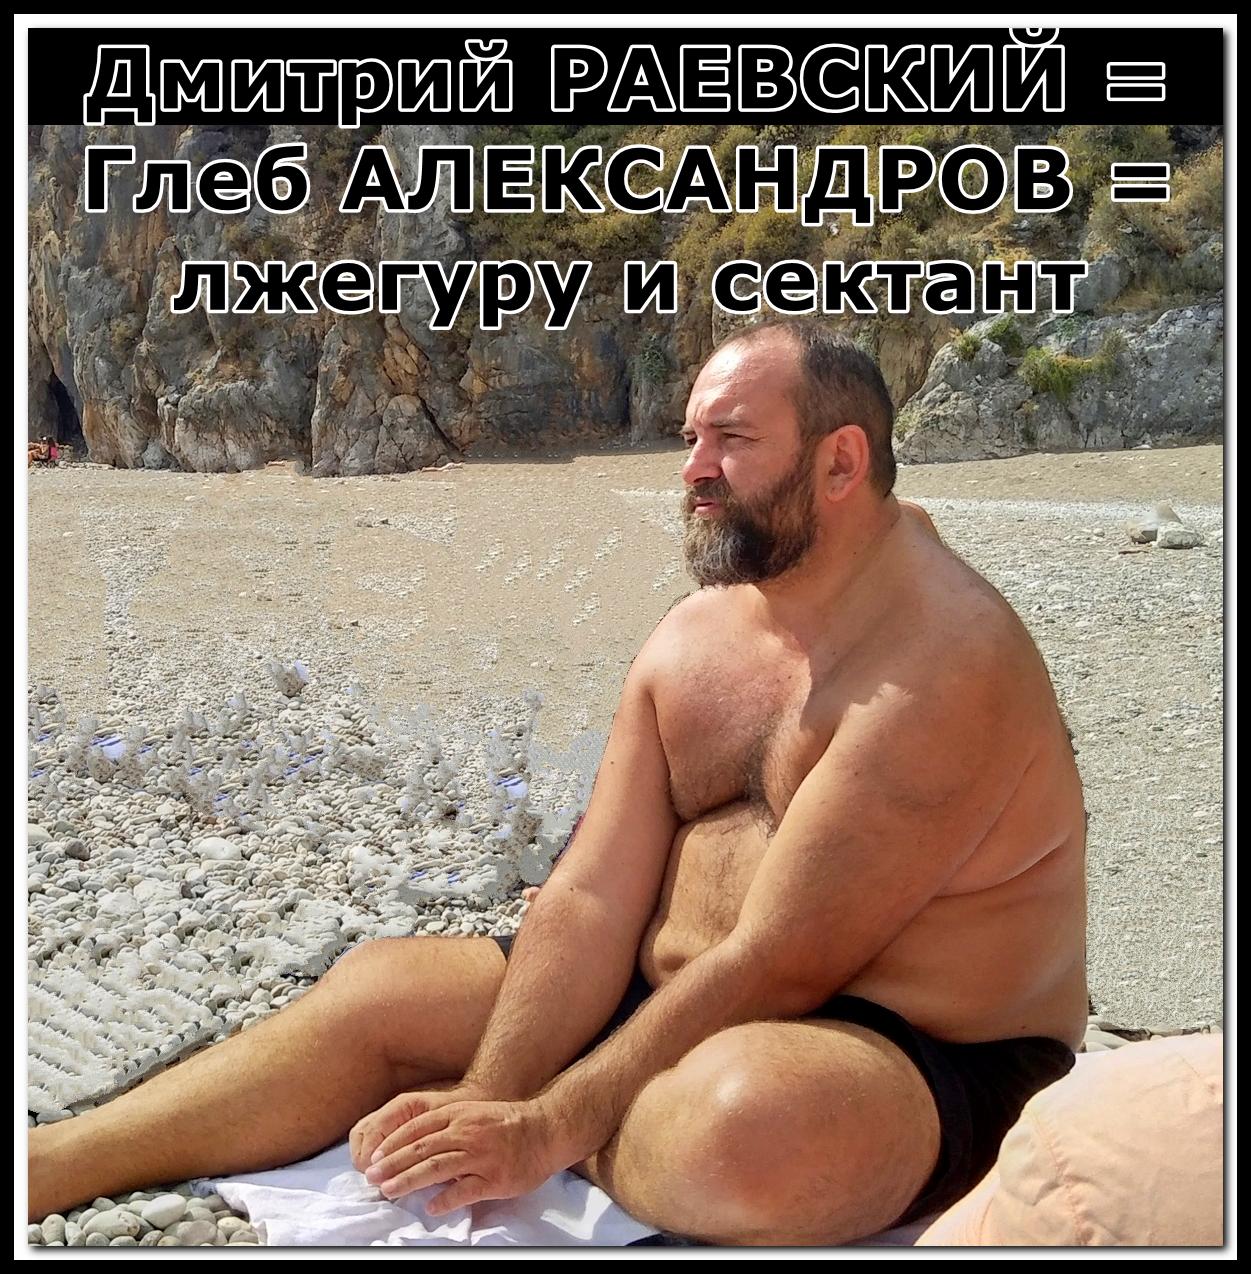 Дмитрий_раевский_лжегуру_сектант